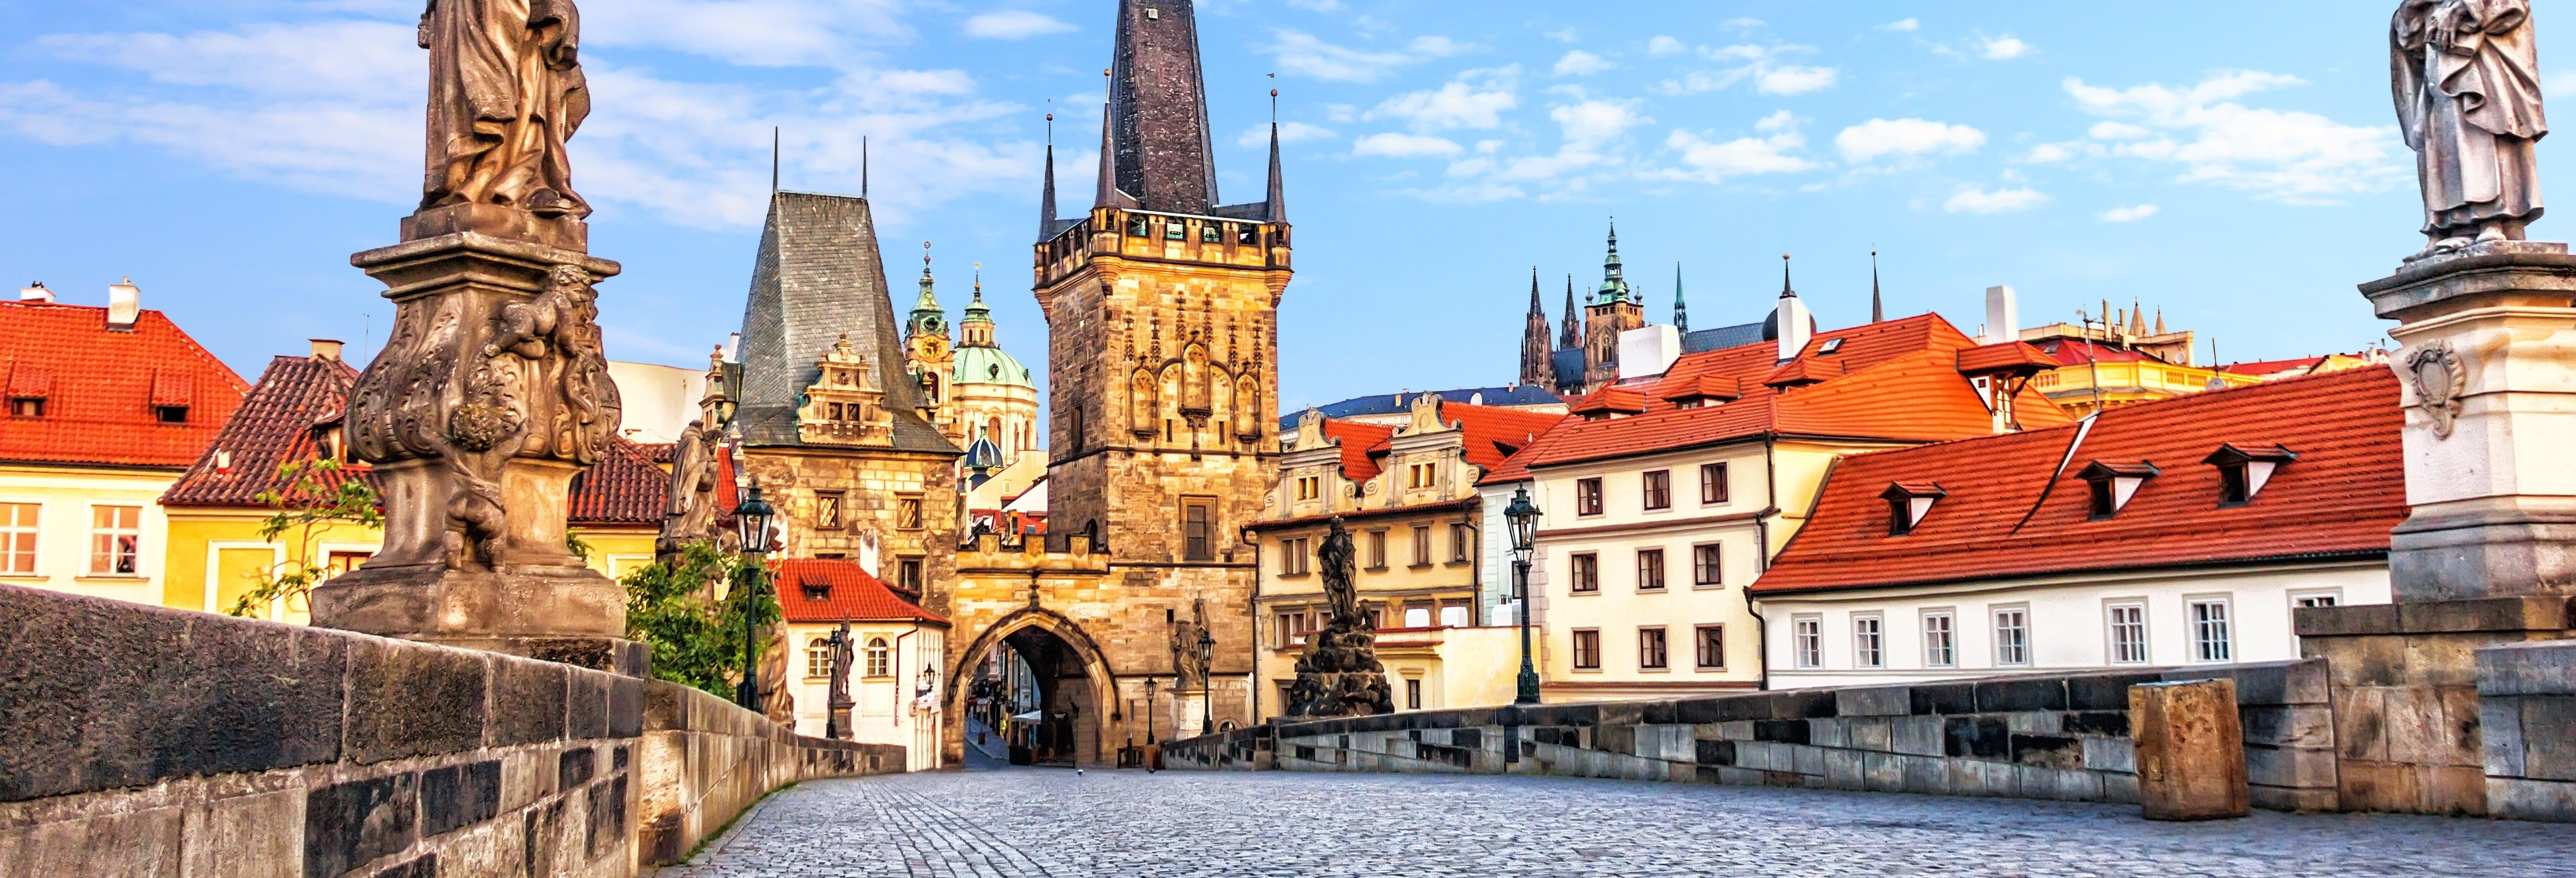 Visita guiada por Mala Strana y Hradčany